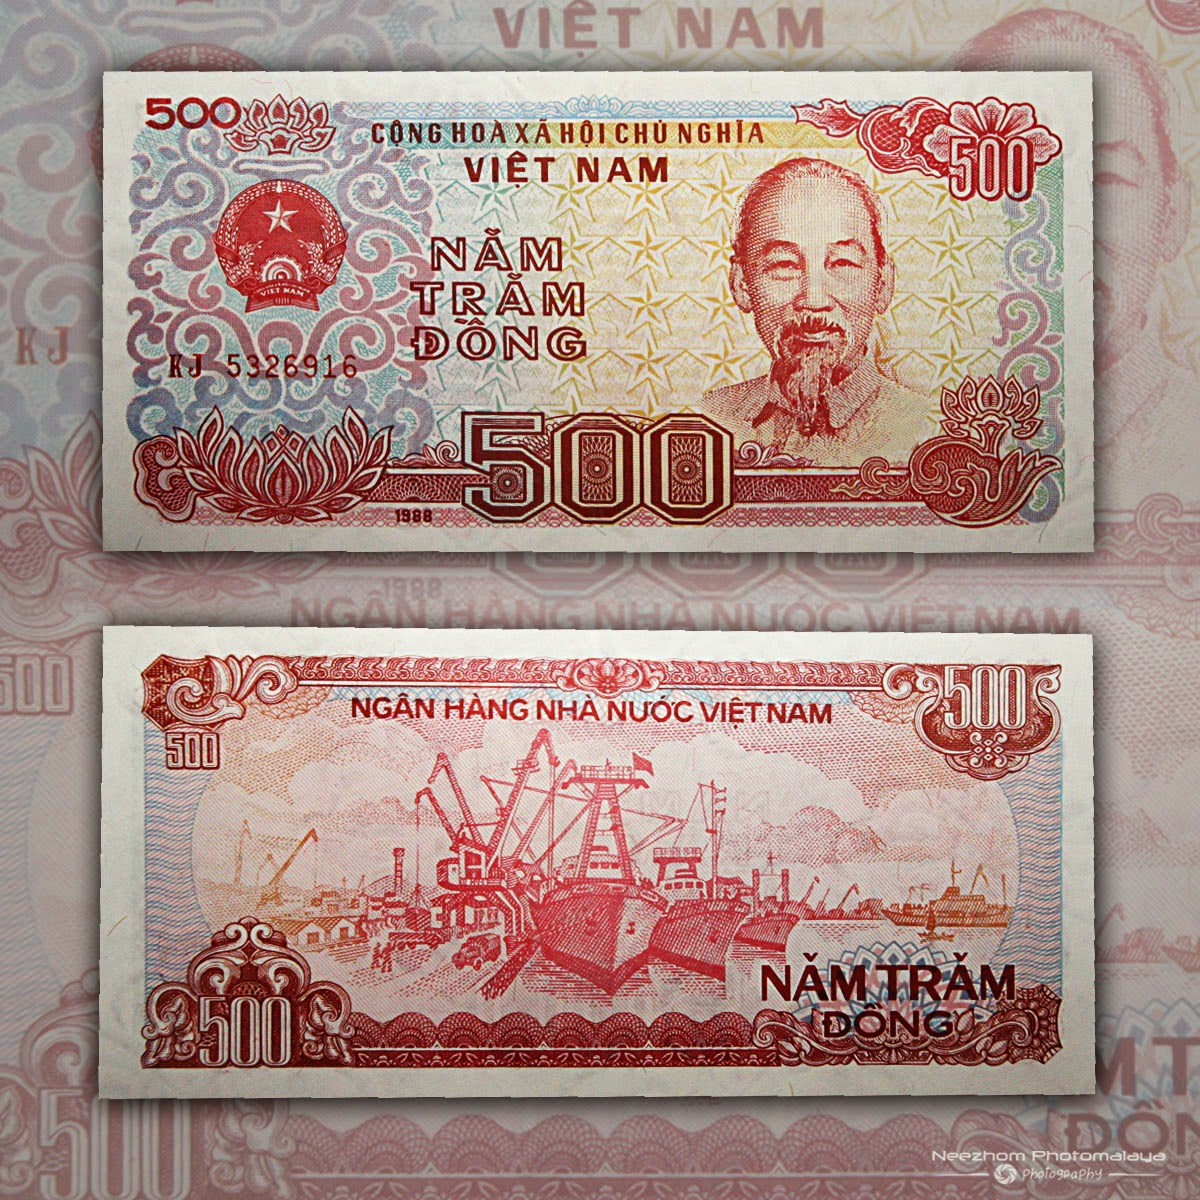 Vietnam banknote 500 Dong 1988